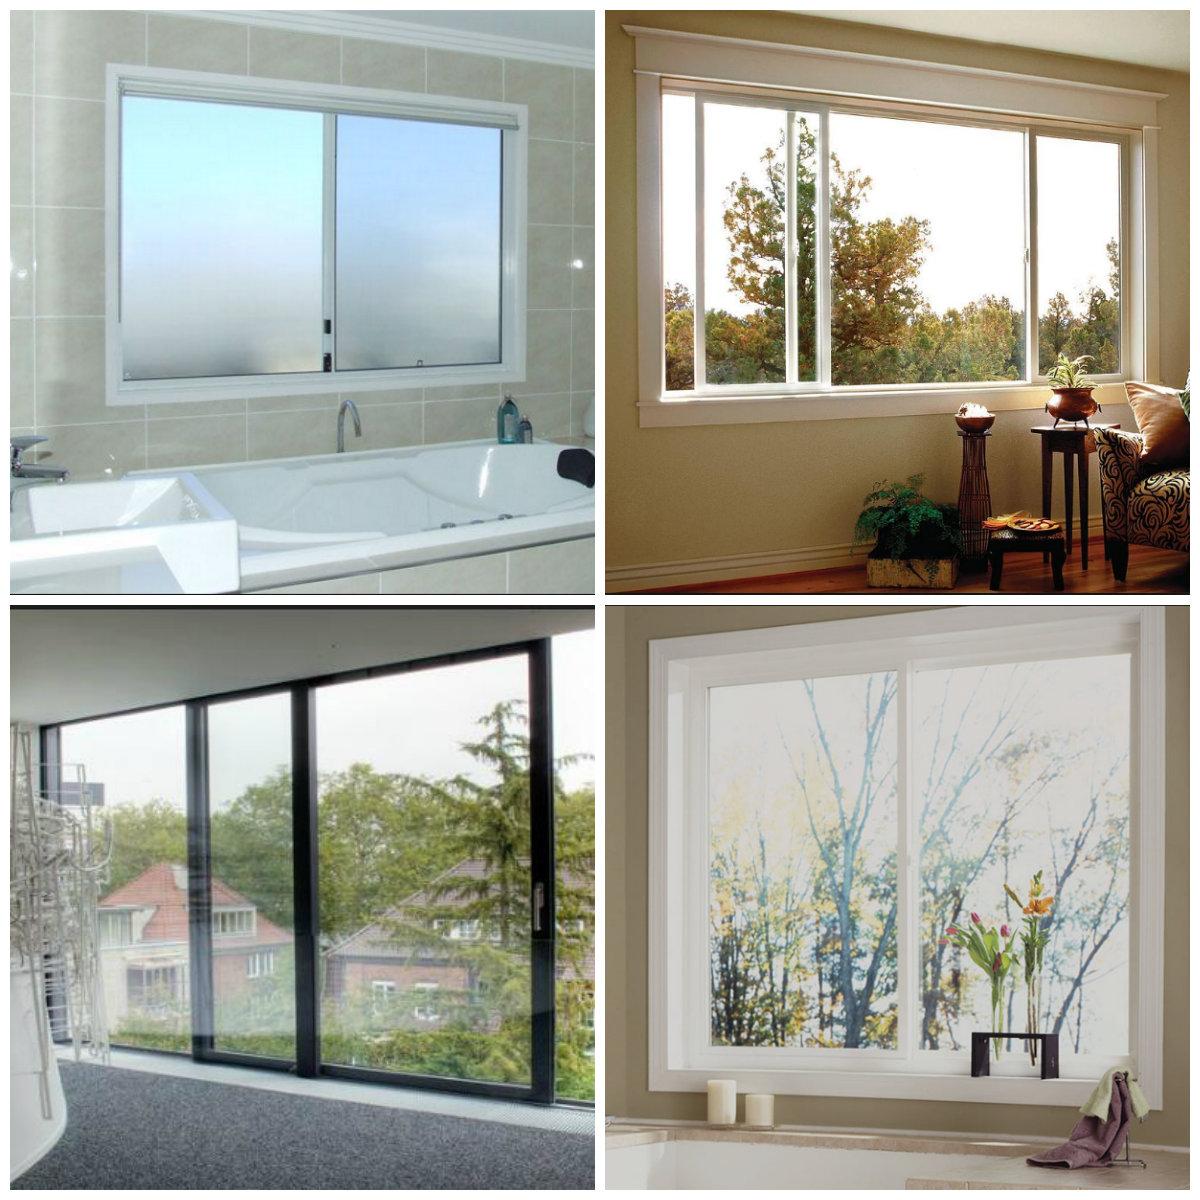 Australia standard aluminium window/double tempered glazed material window/ double panel aluminium  frame sliding window